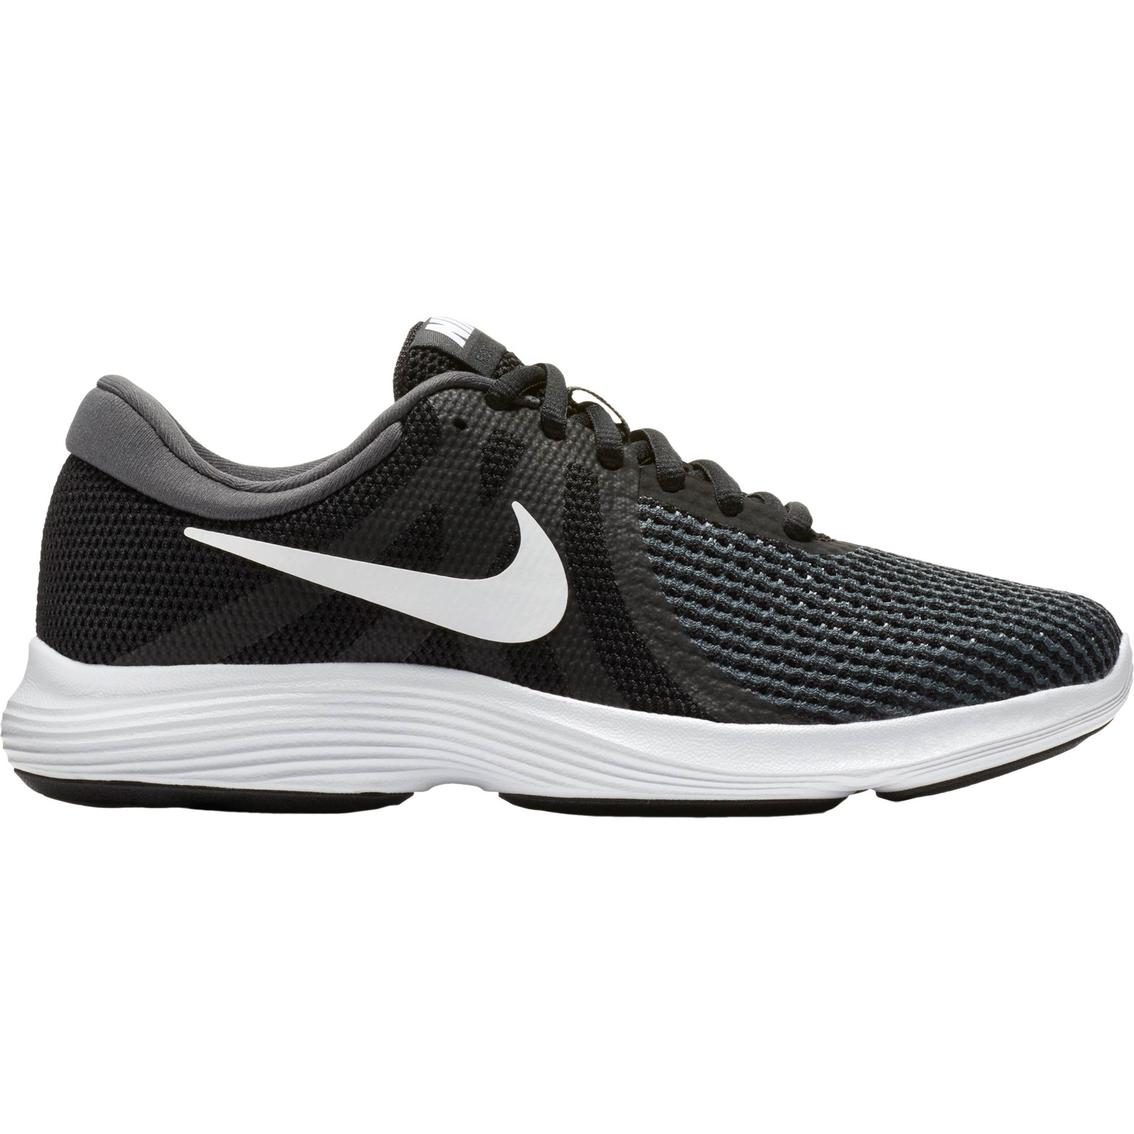 01e1a762ea04 Nike Women s Flex Experience Rn 7 Running Shoes